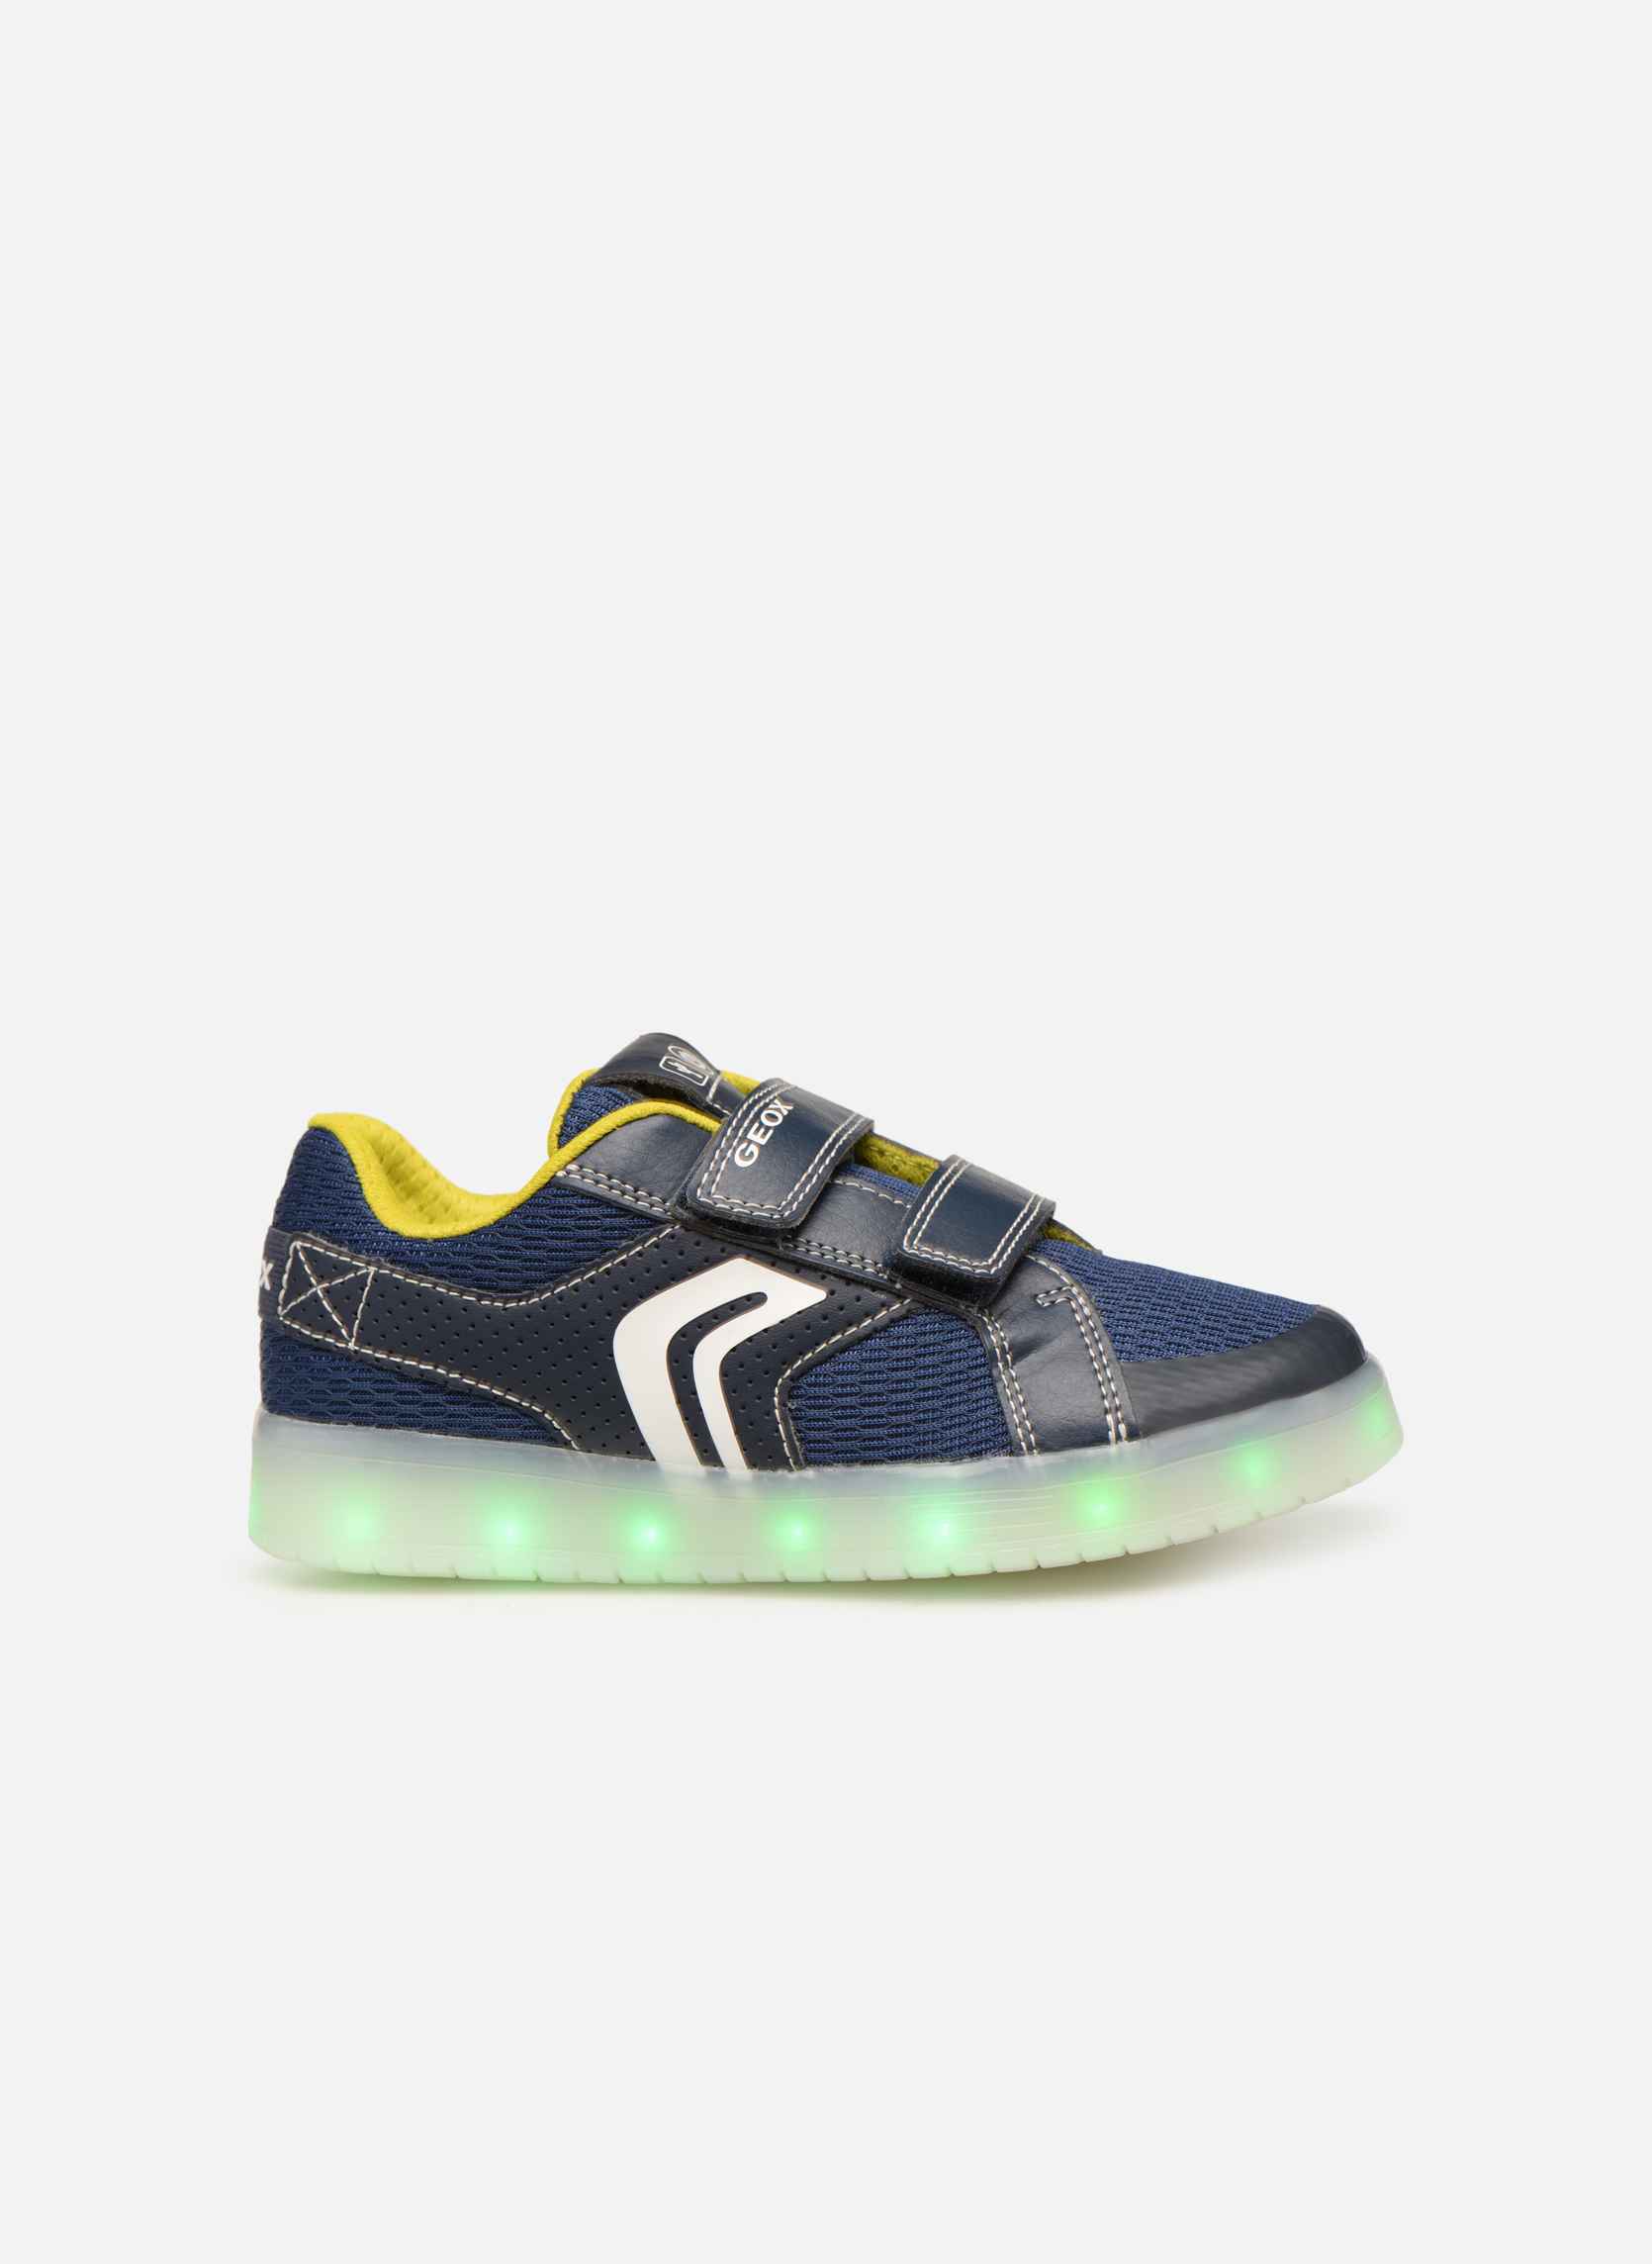 d49e3f0c1 Zapatos niños online  calzado niños